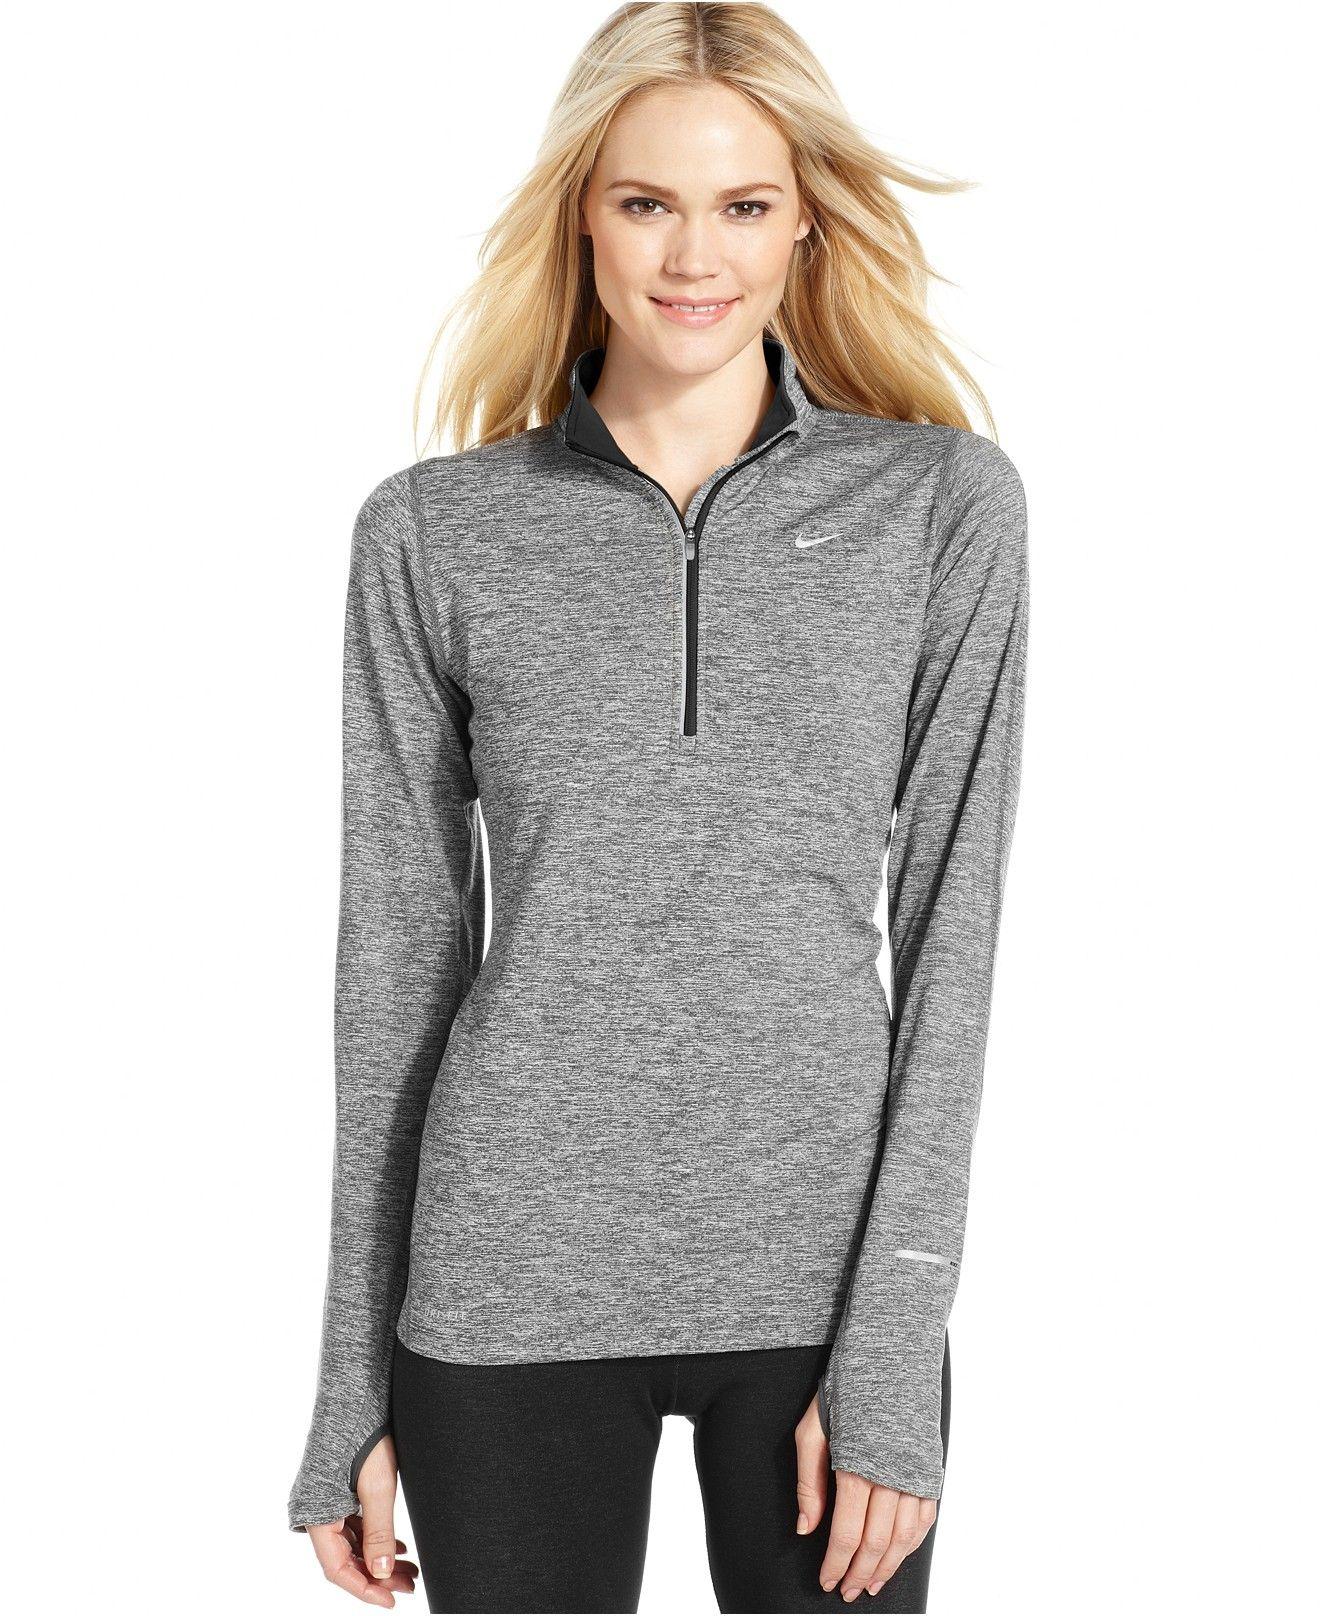 Nike Element Dri FIT Half Zip Pullover Tops Women